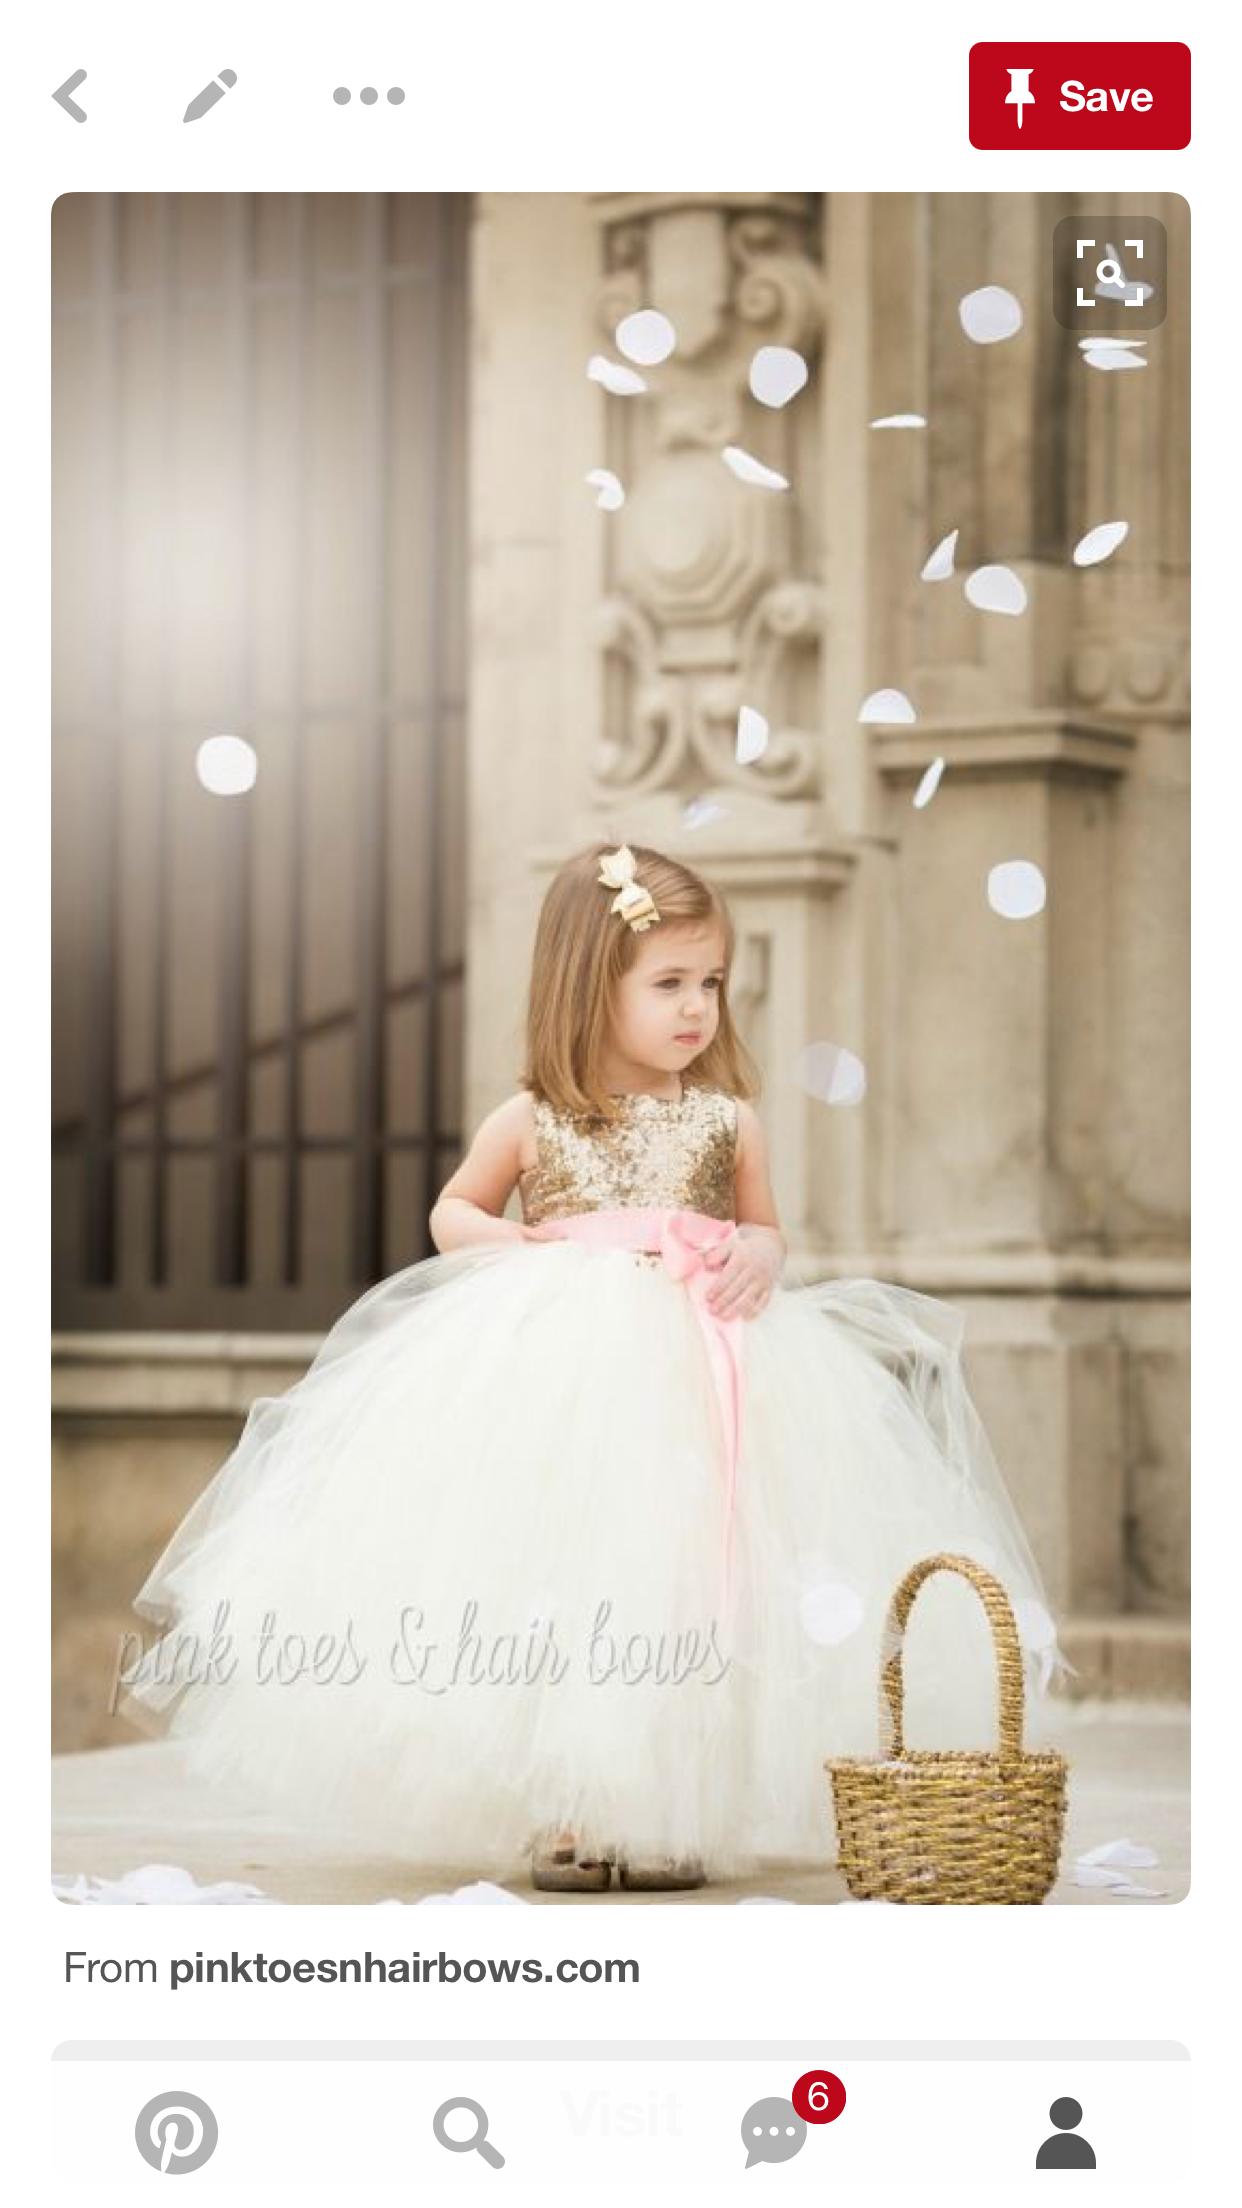 Pink and gold dress for kids  Pin by Jacqueline Lovik on Kids  Pinterest  Girls dresses Flower